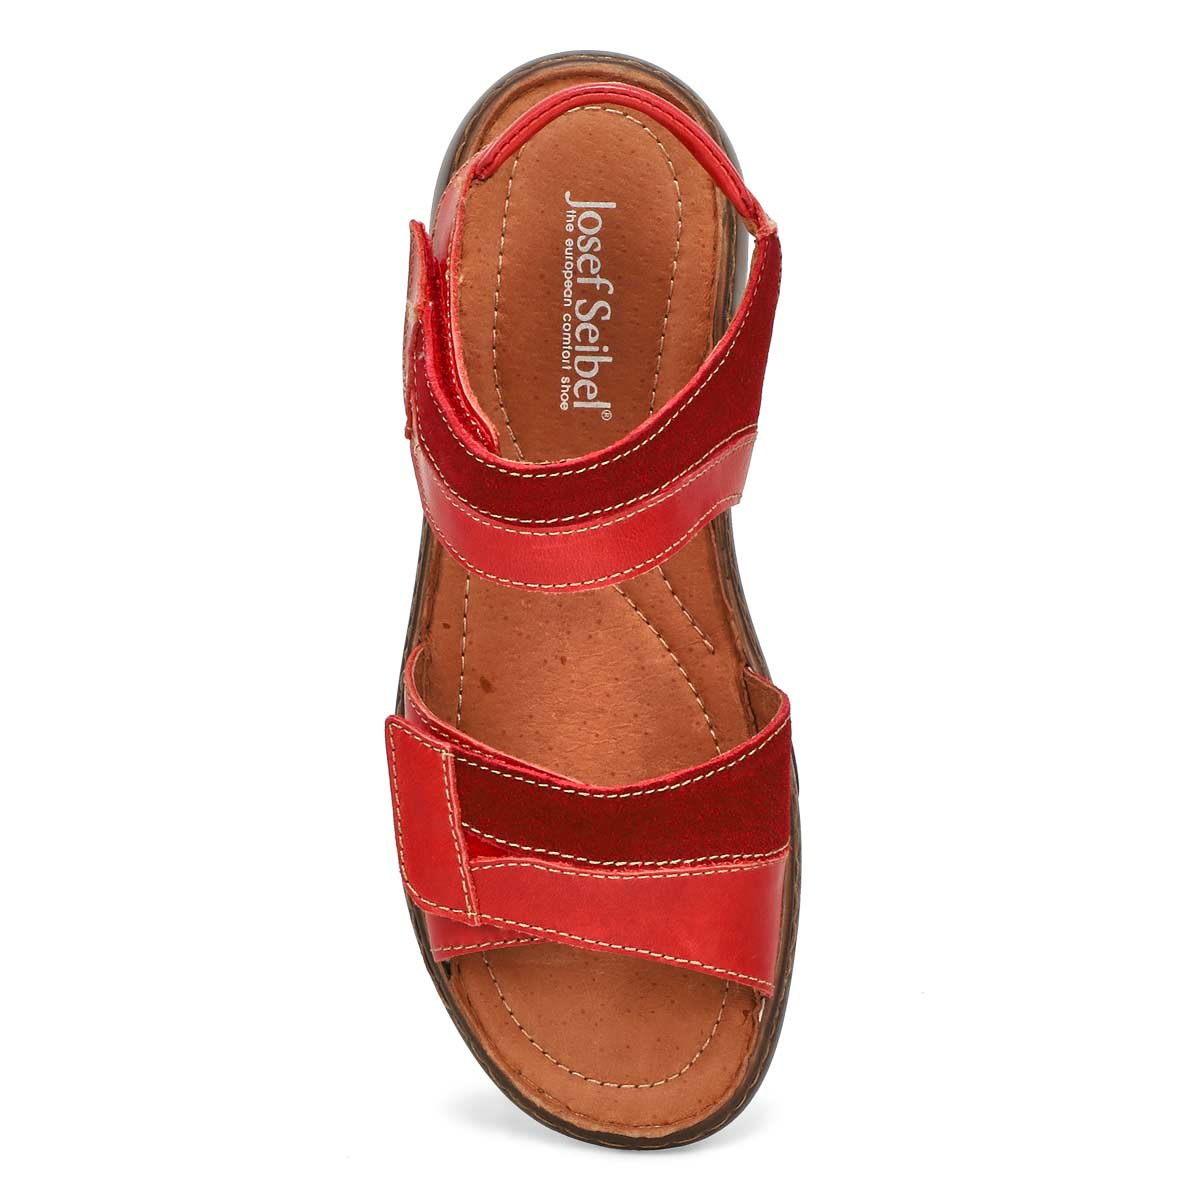 Women's Debra 19 Casual 2 Strap Sandal - Red